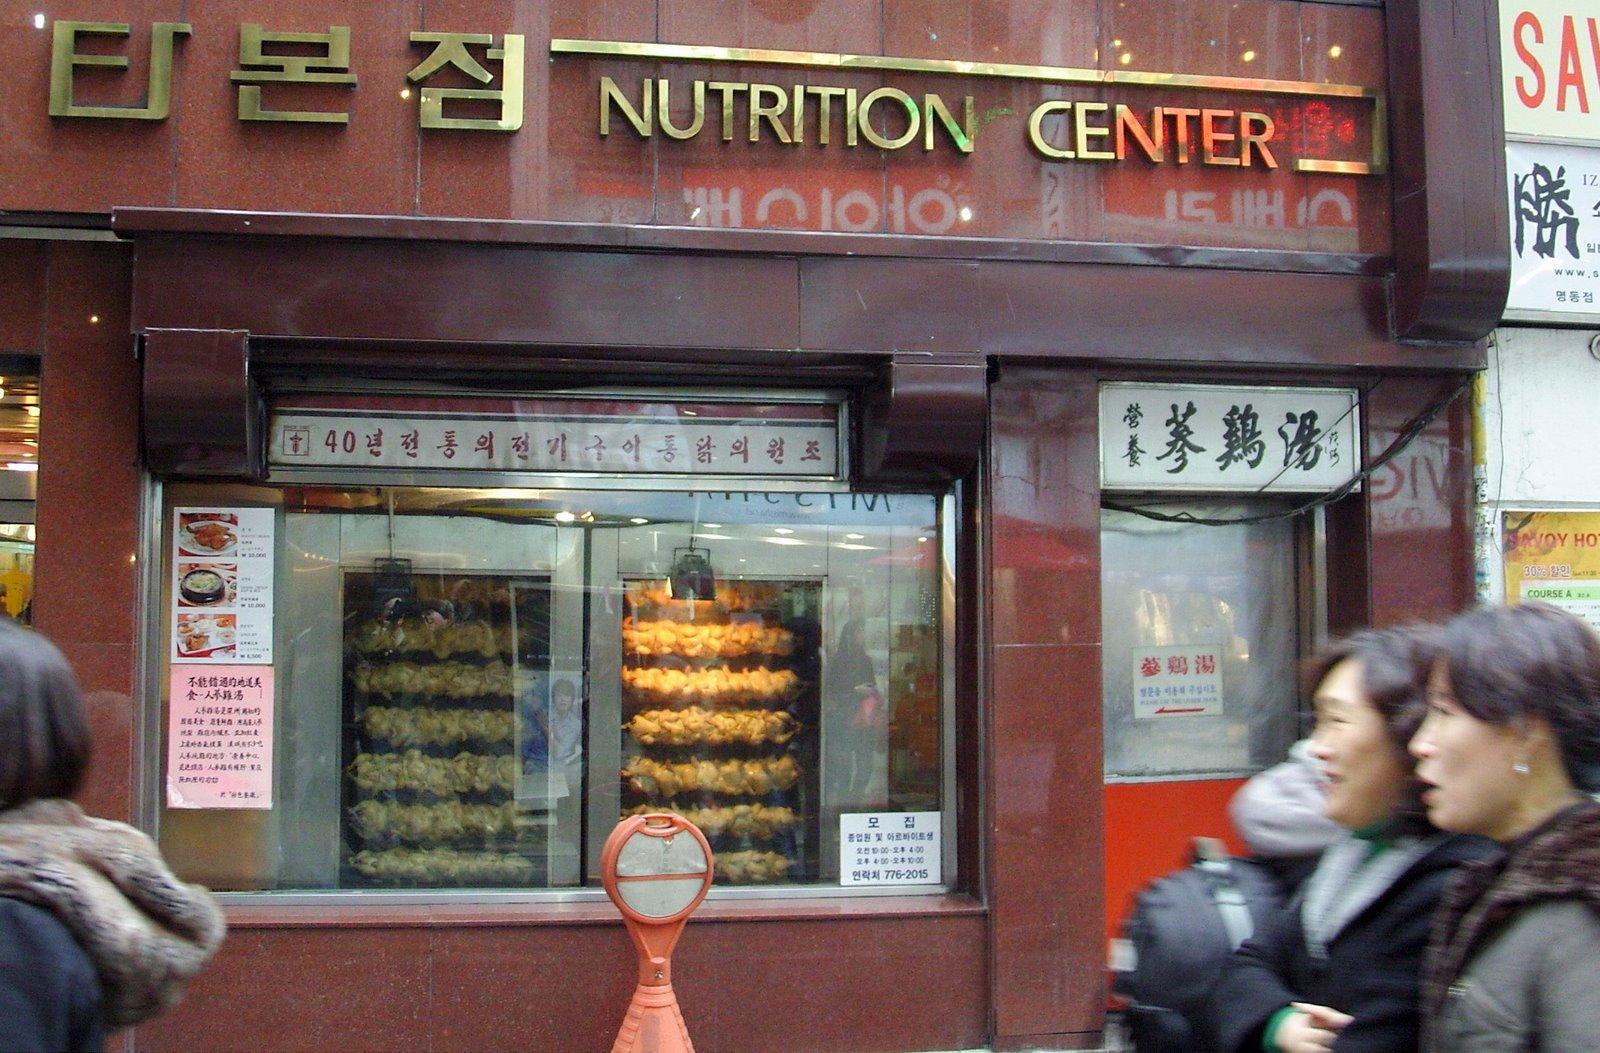 [nutrution]